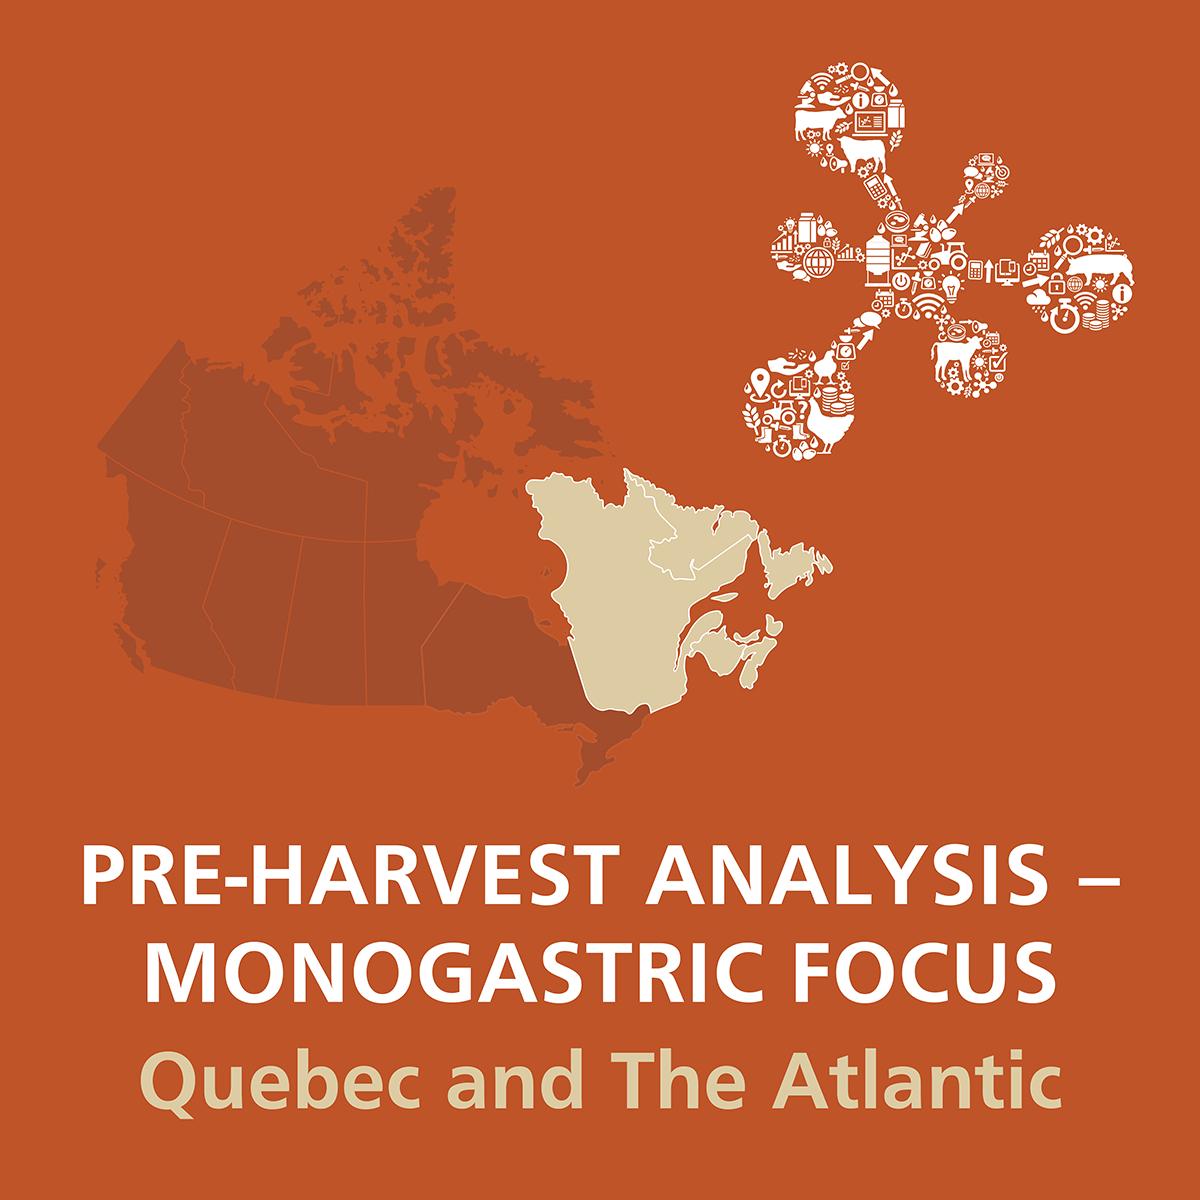 PreHarvestAnalysis_MonogastricFocus_QA